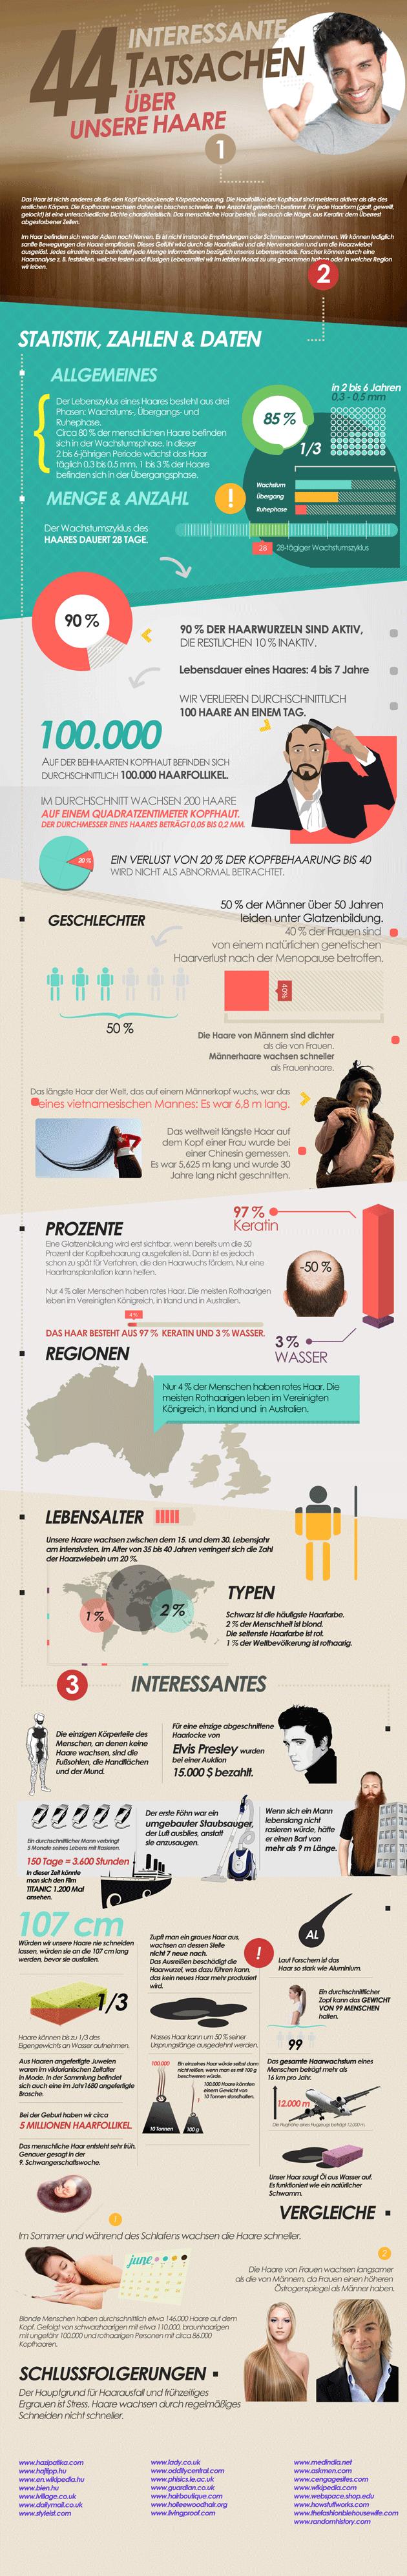 Infografik 44 interessante Tatsachen über unsere Haare